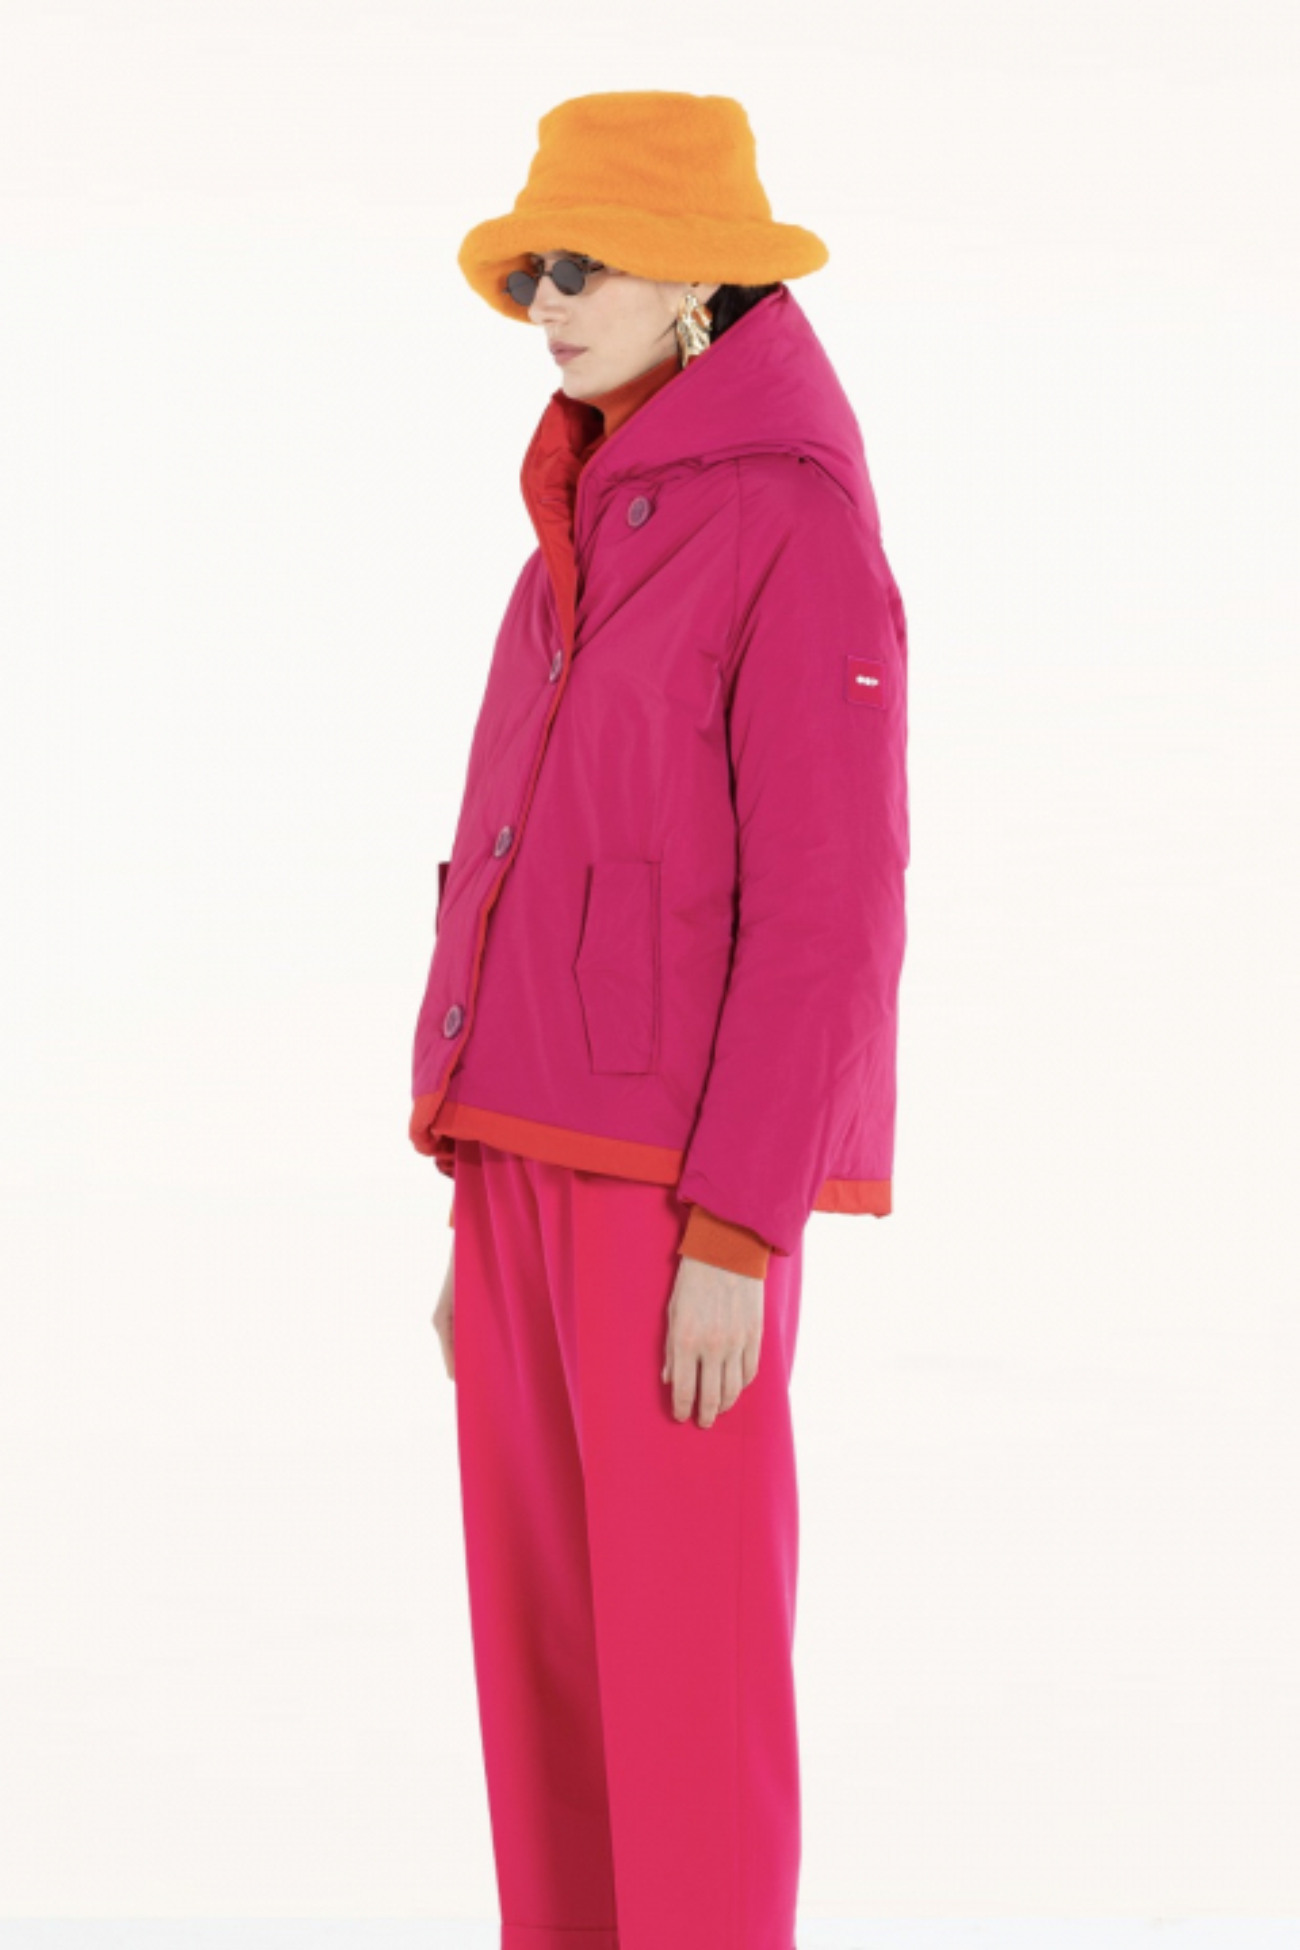 Short jacket 9006 in fuchsia/red shape memory fabric